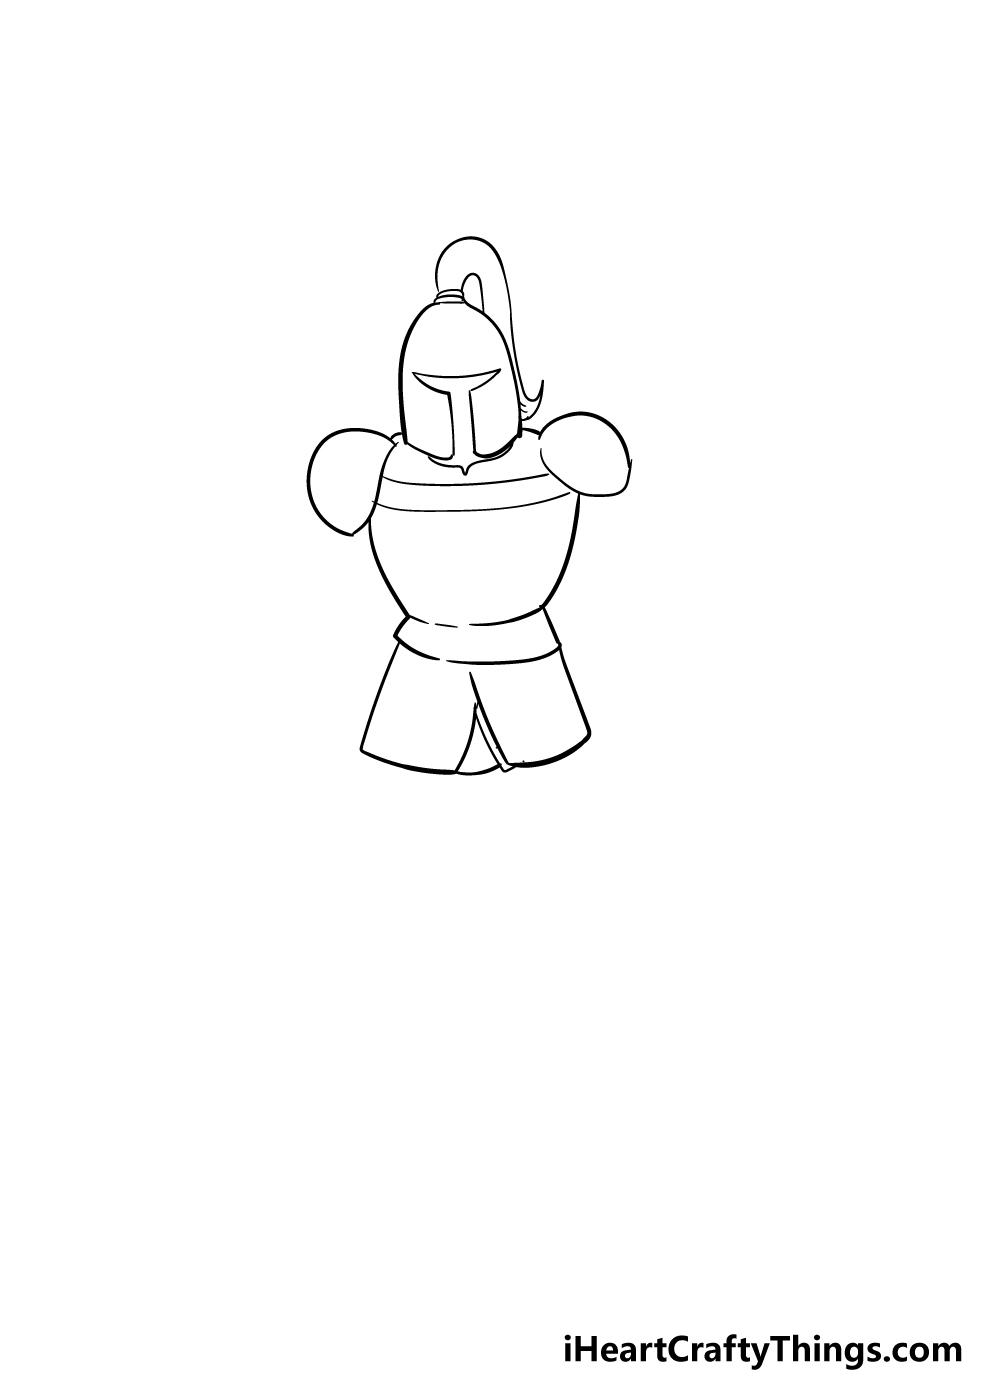 knight drawing step 3